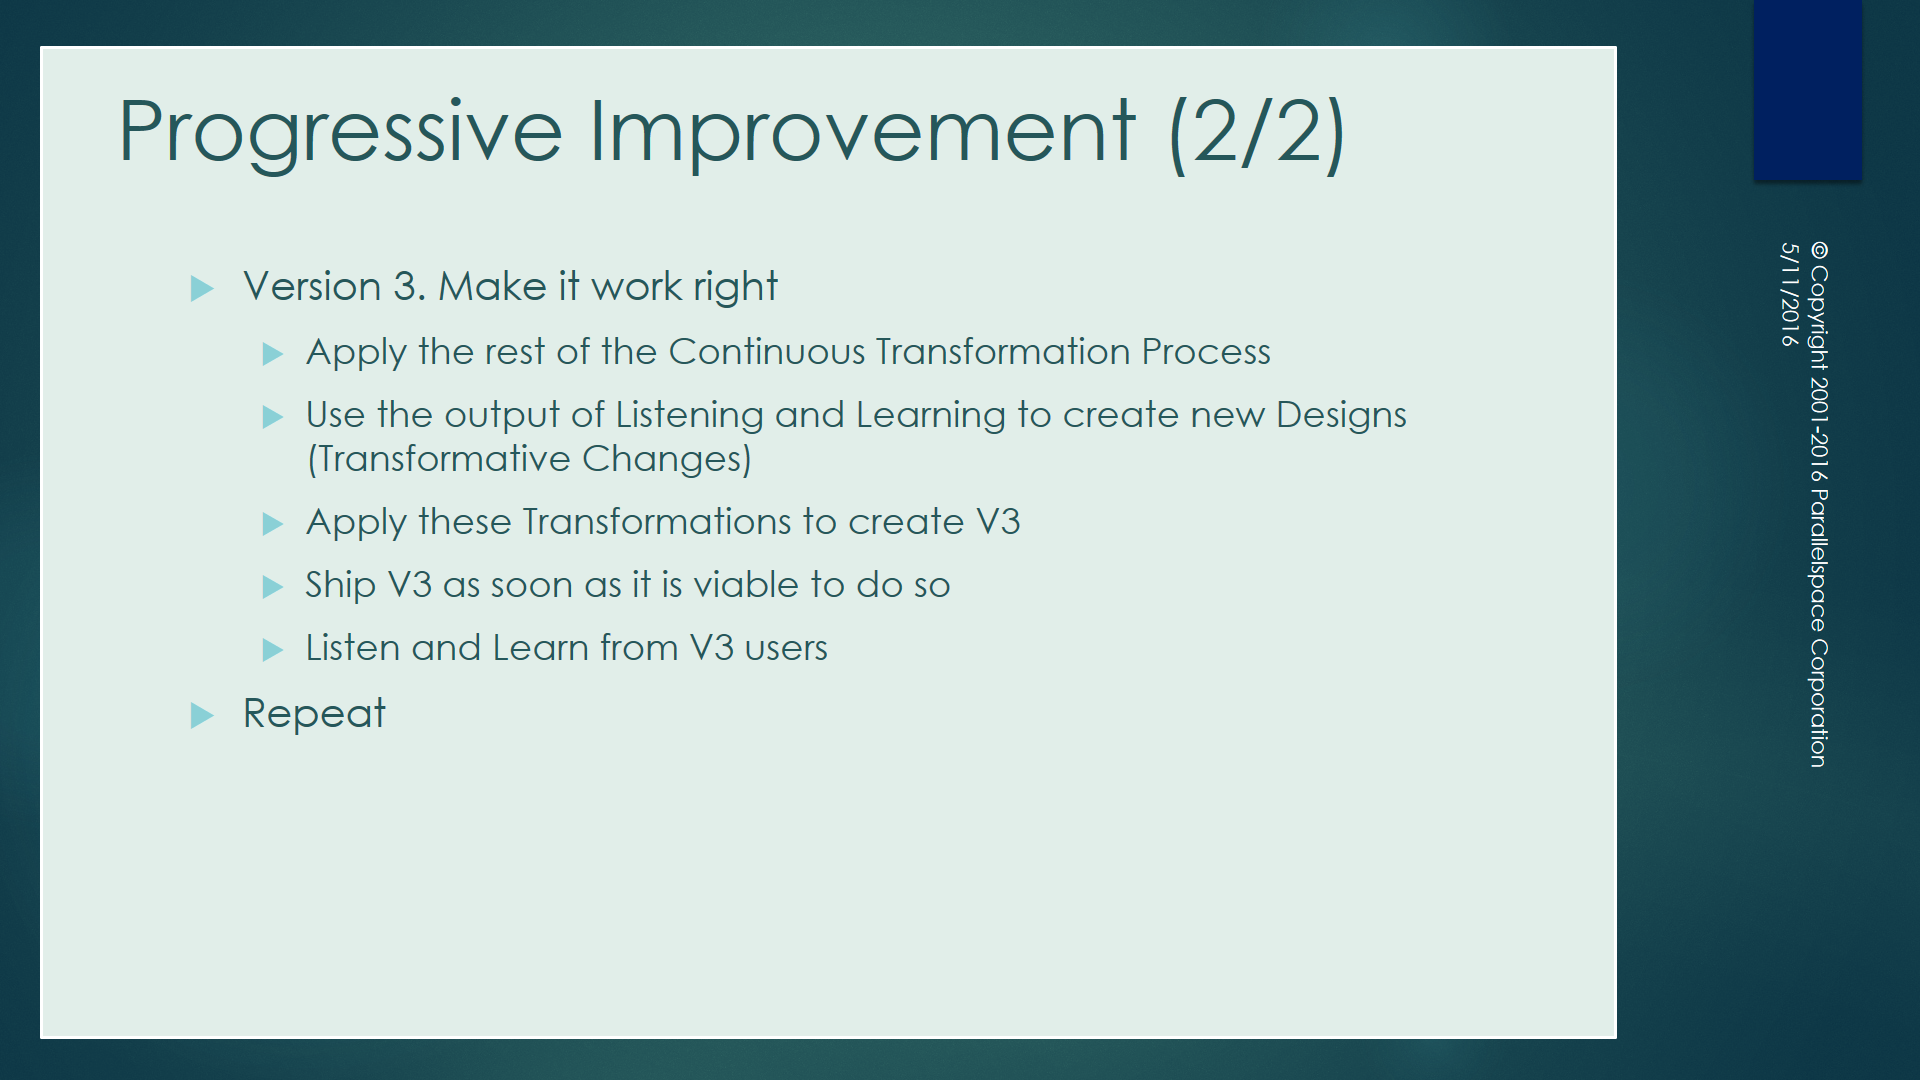 progressive-improvement-b-1-0-1